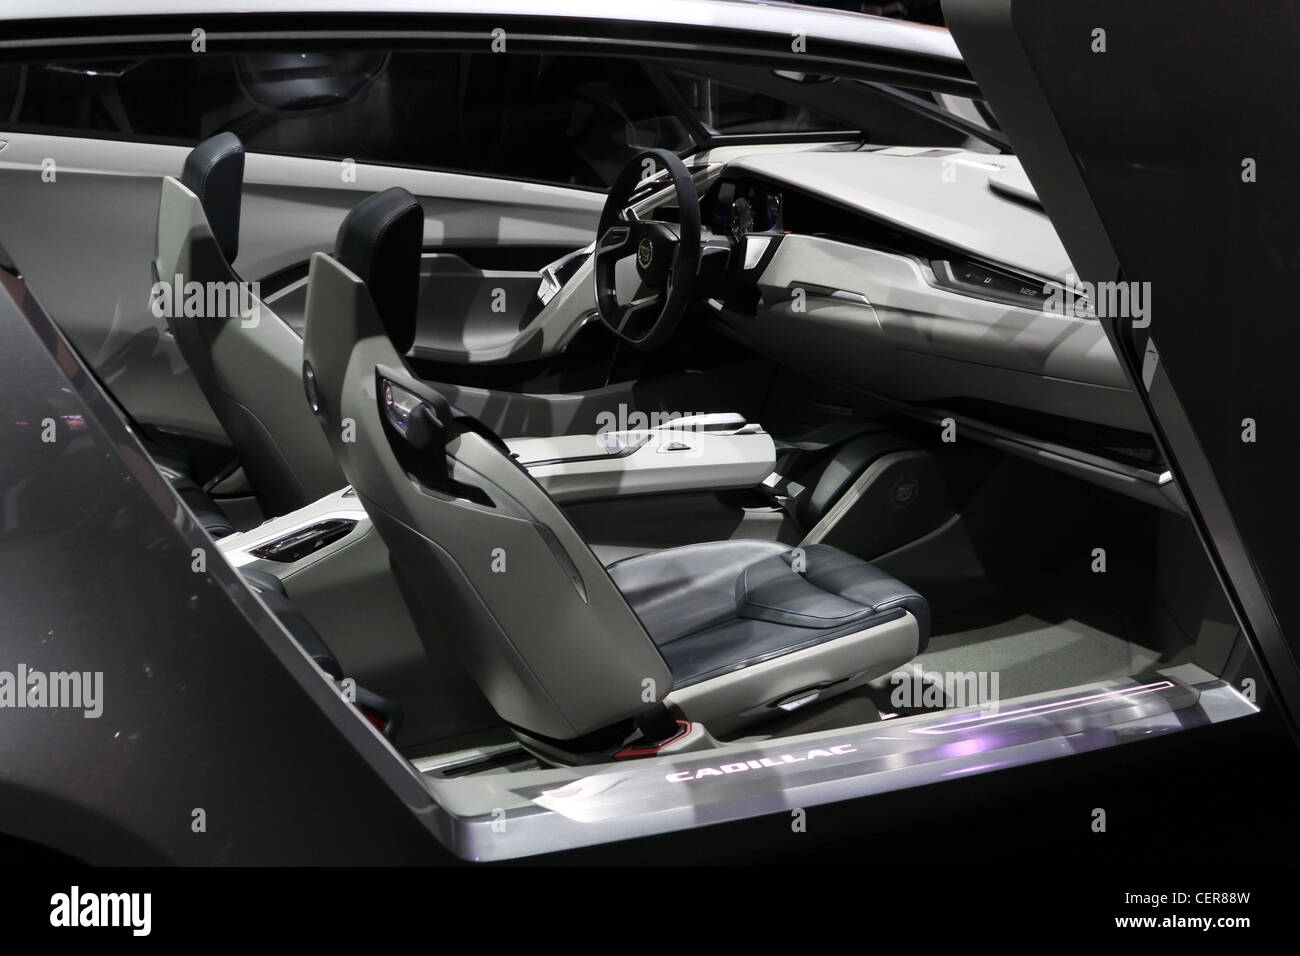 Cadillac Urban Luxury Concept Car Interior Stock Photo 43537337 Alamy